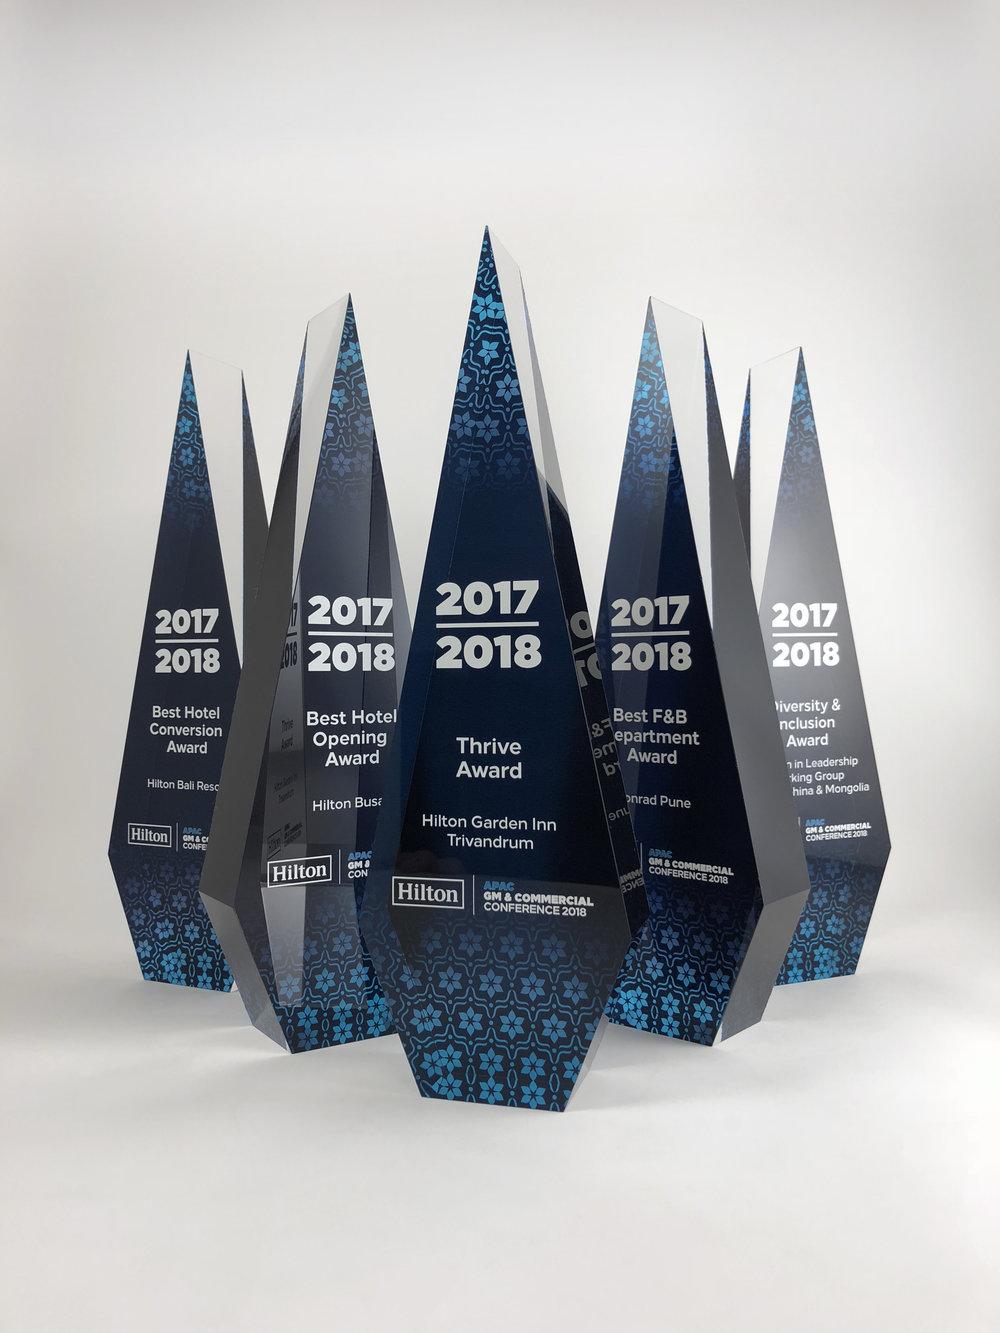 hilton-apac-awards-acrylic-trophy-01.jpg